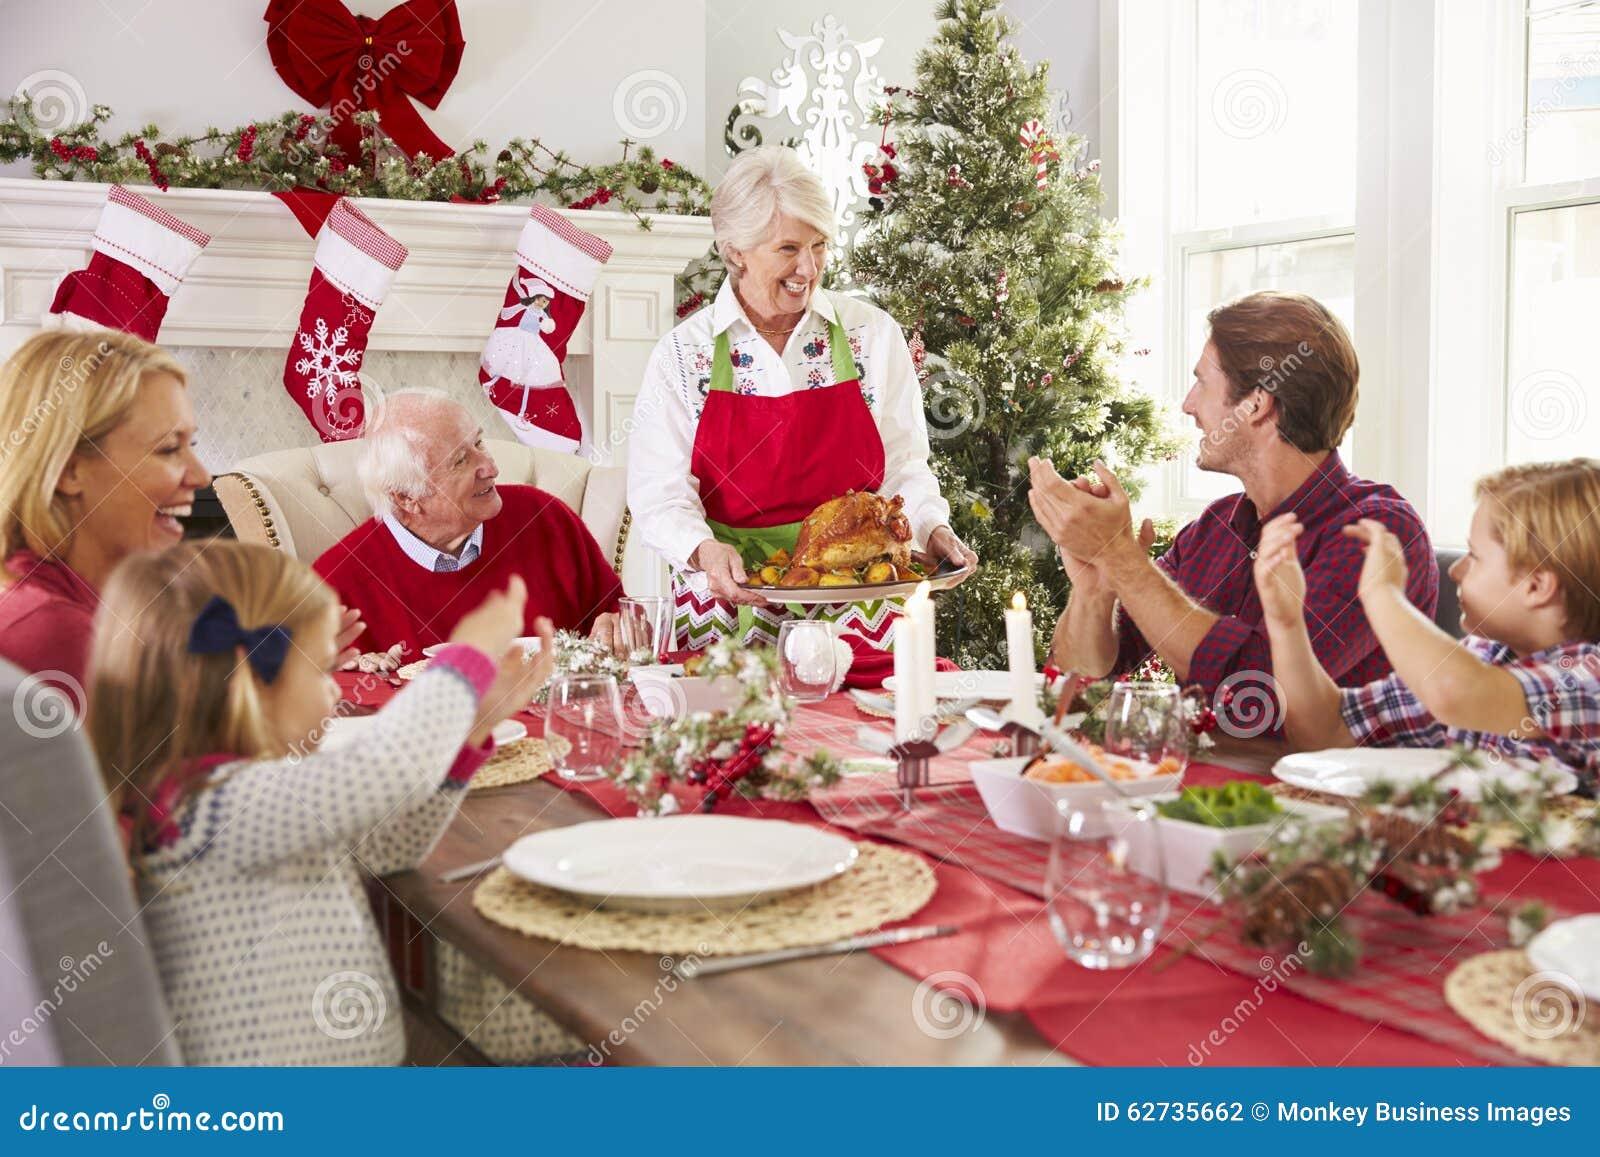 Grand m re mettant en vidence la turquie au repas de no l for Idee repas convivial en famille